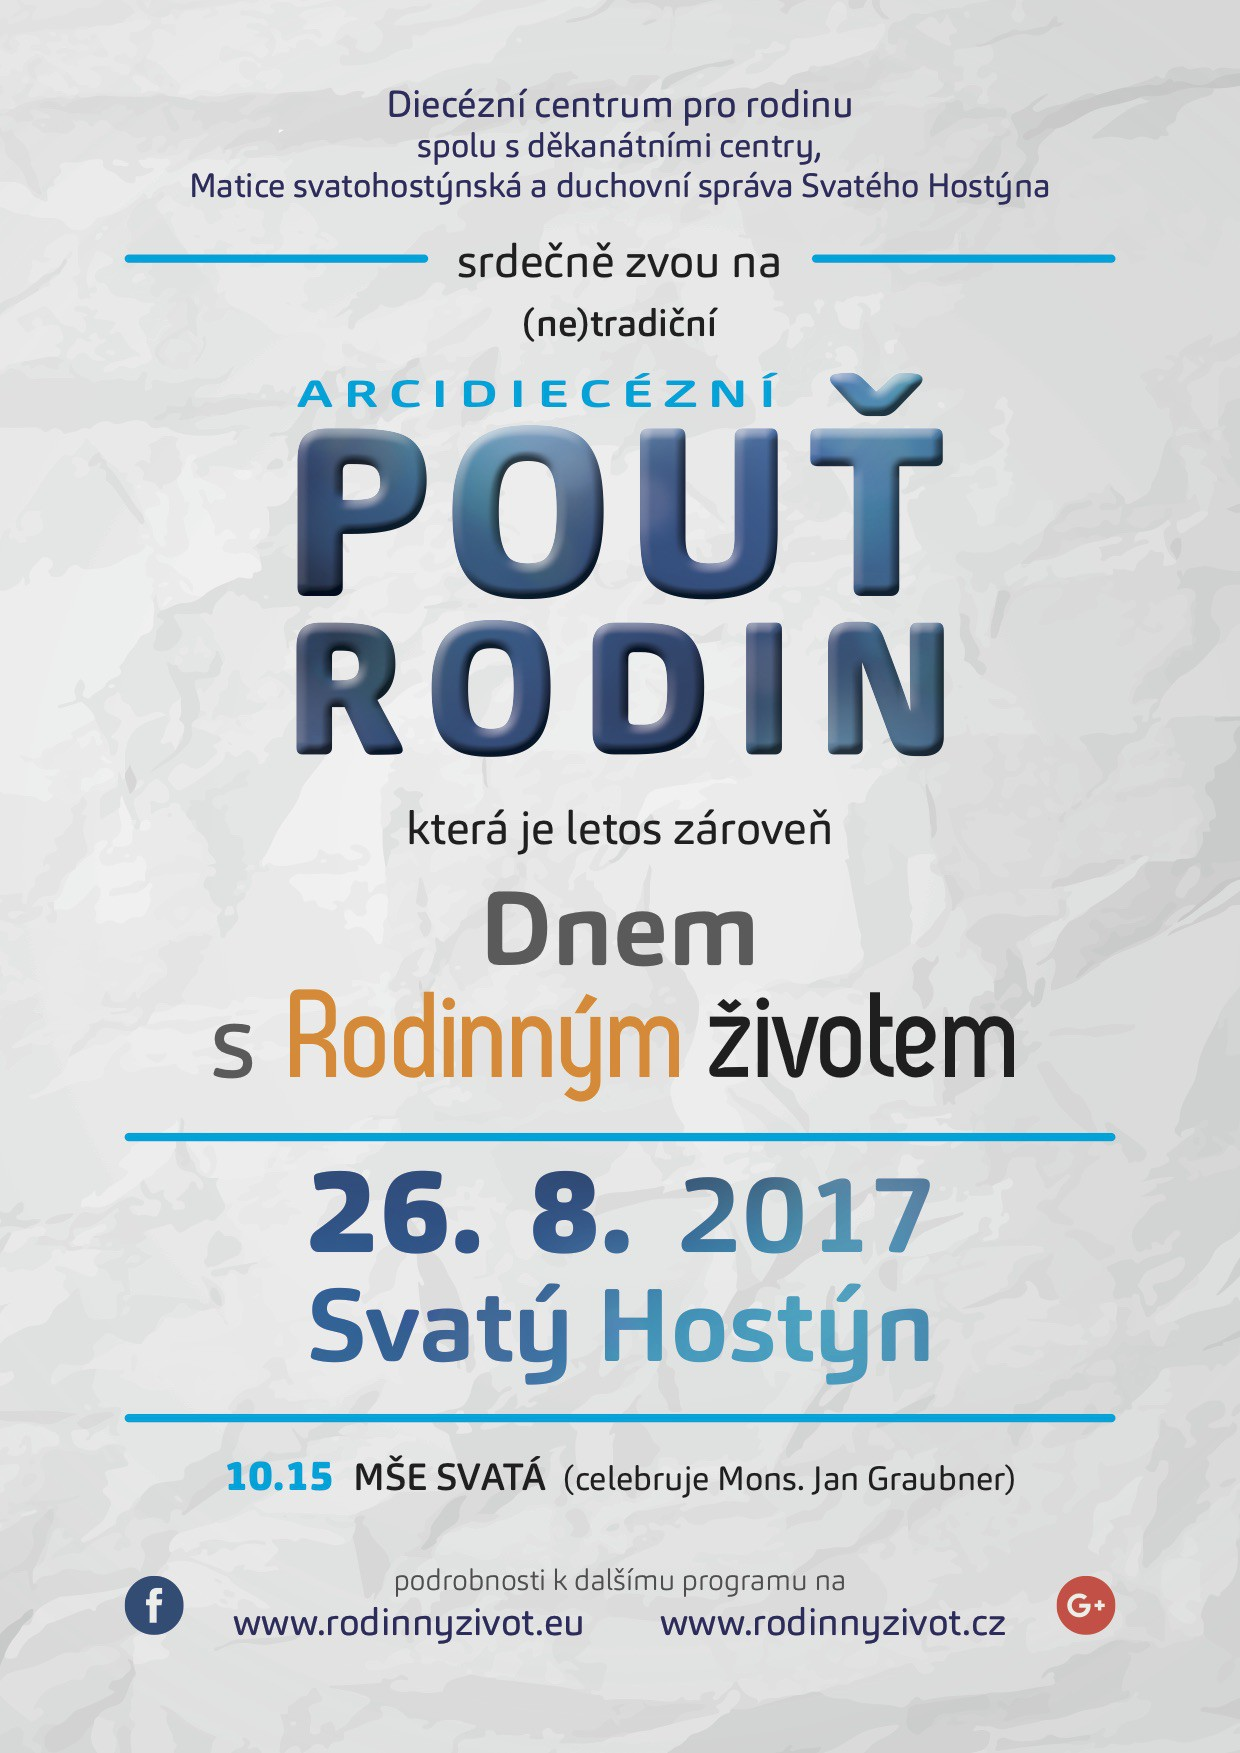 Plakat-arcipout-rodin-DRZ-2017v2.jpg